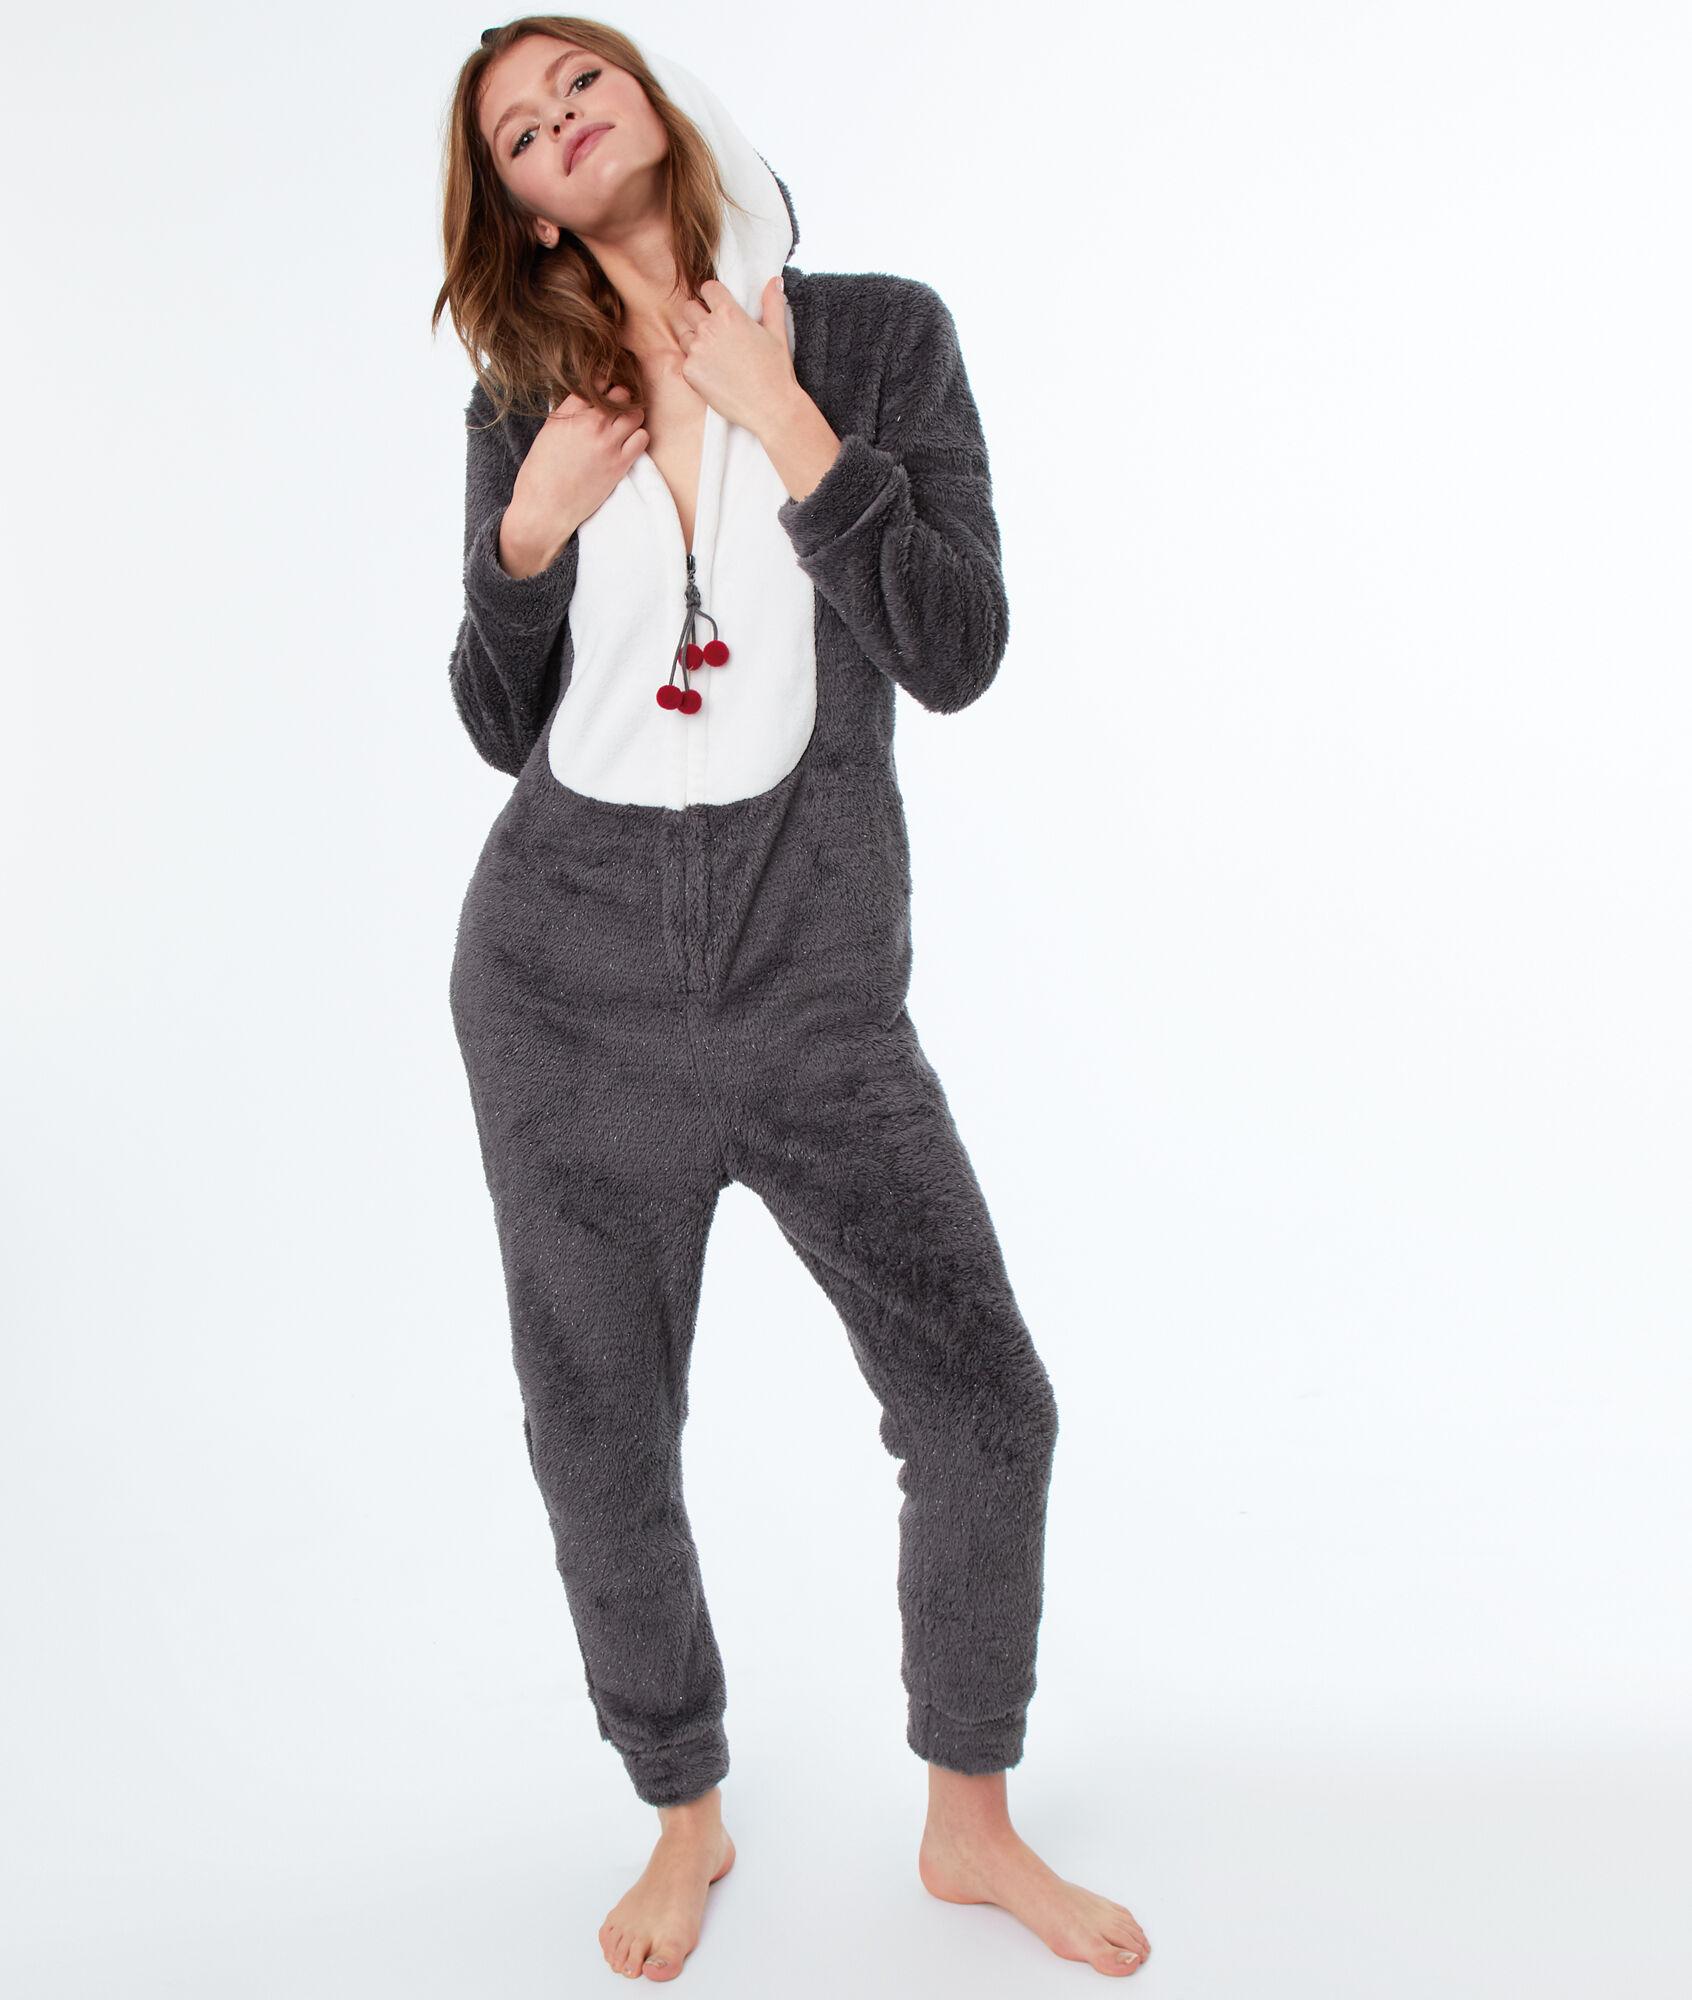 énorme réduction 9f30c 77166 Combinaison Angela Etam Pyjama Gris Pingouin ebWD29YEHI